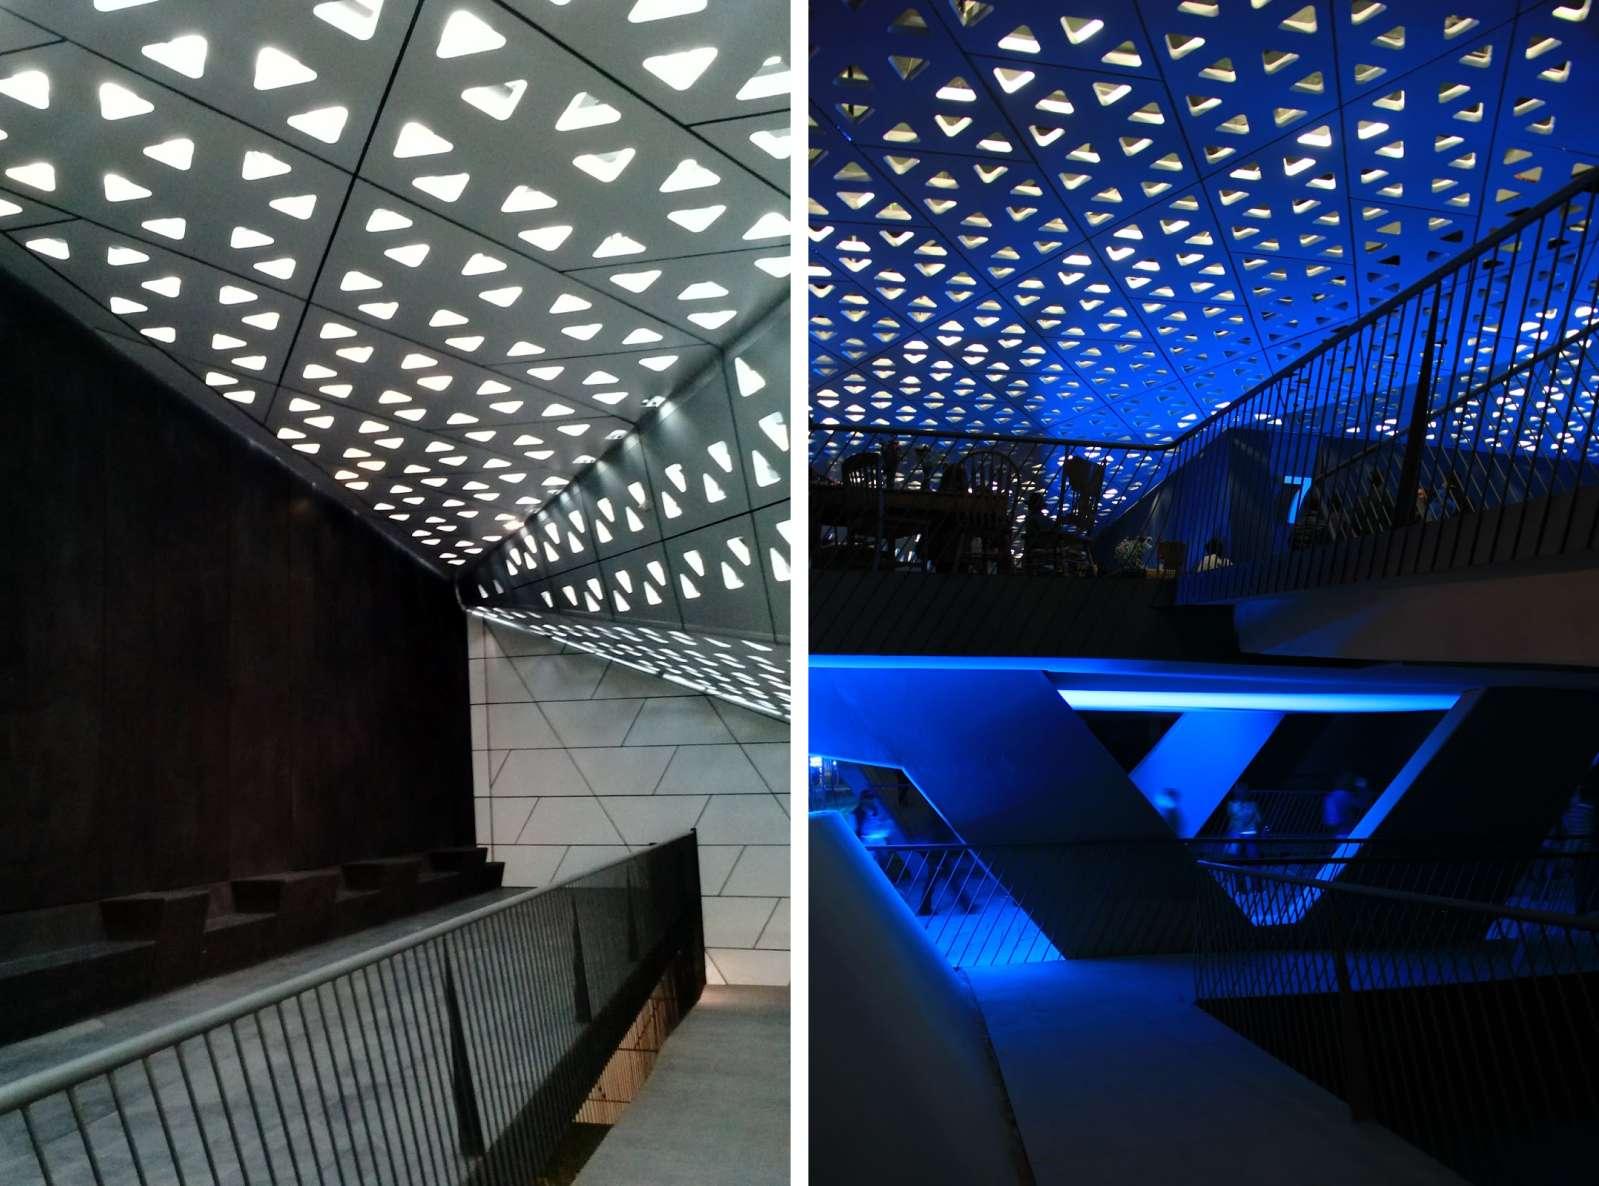 11-Cineteca-Nacional-Siglo XXI-por Rojkind Arquitectos-